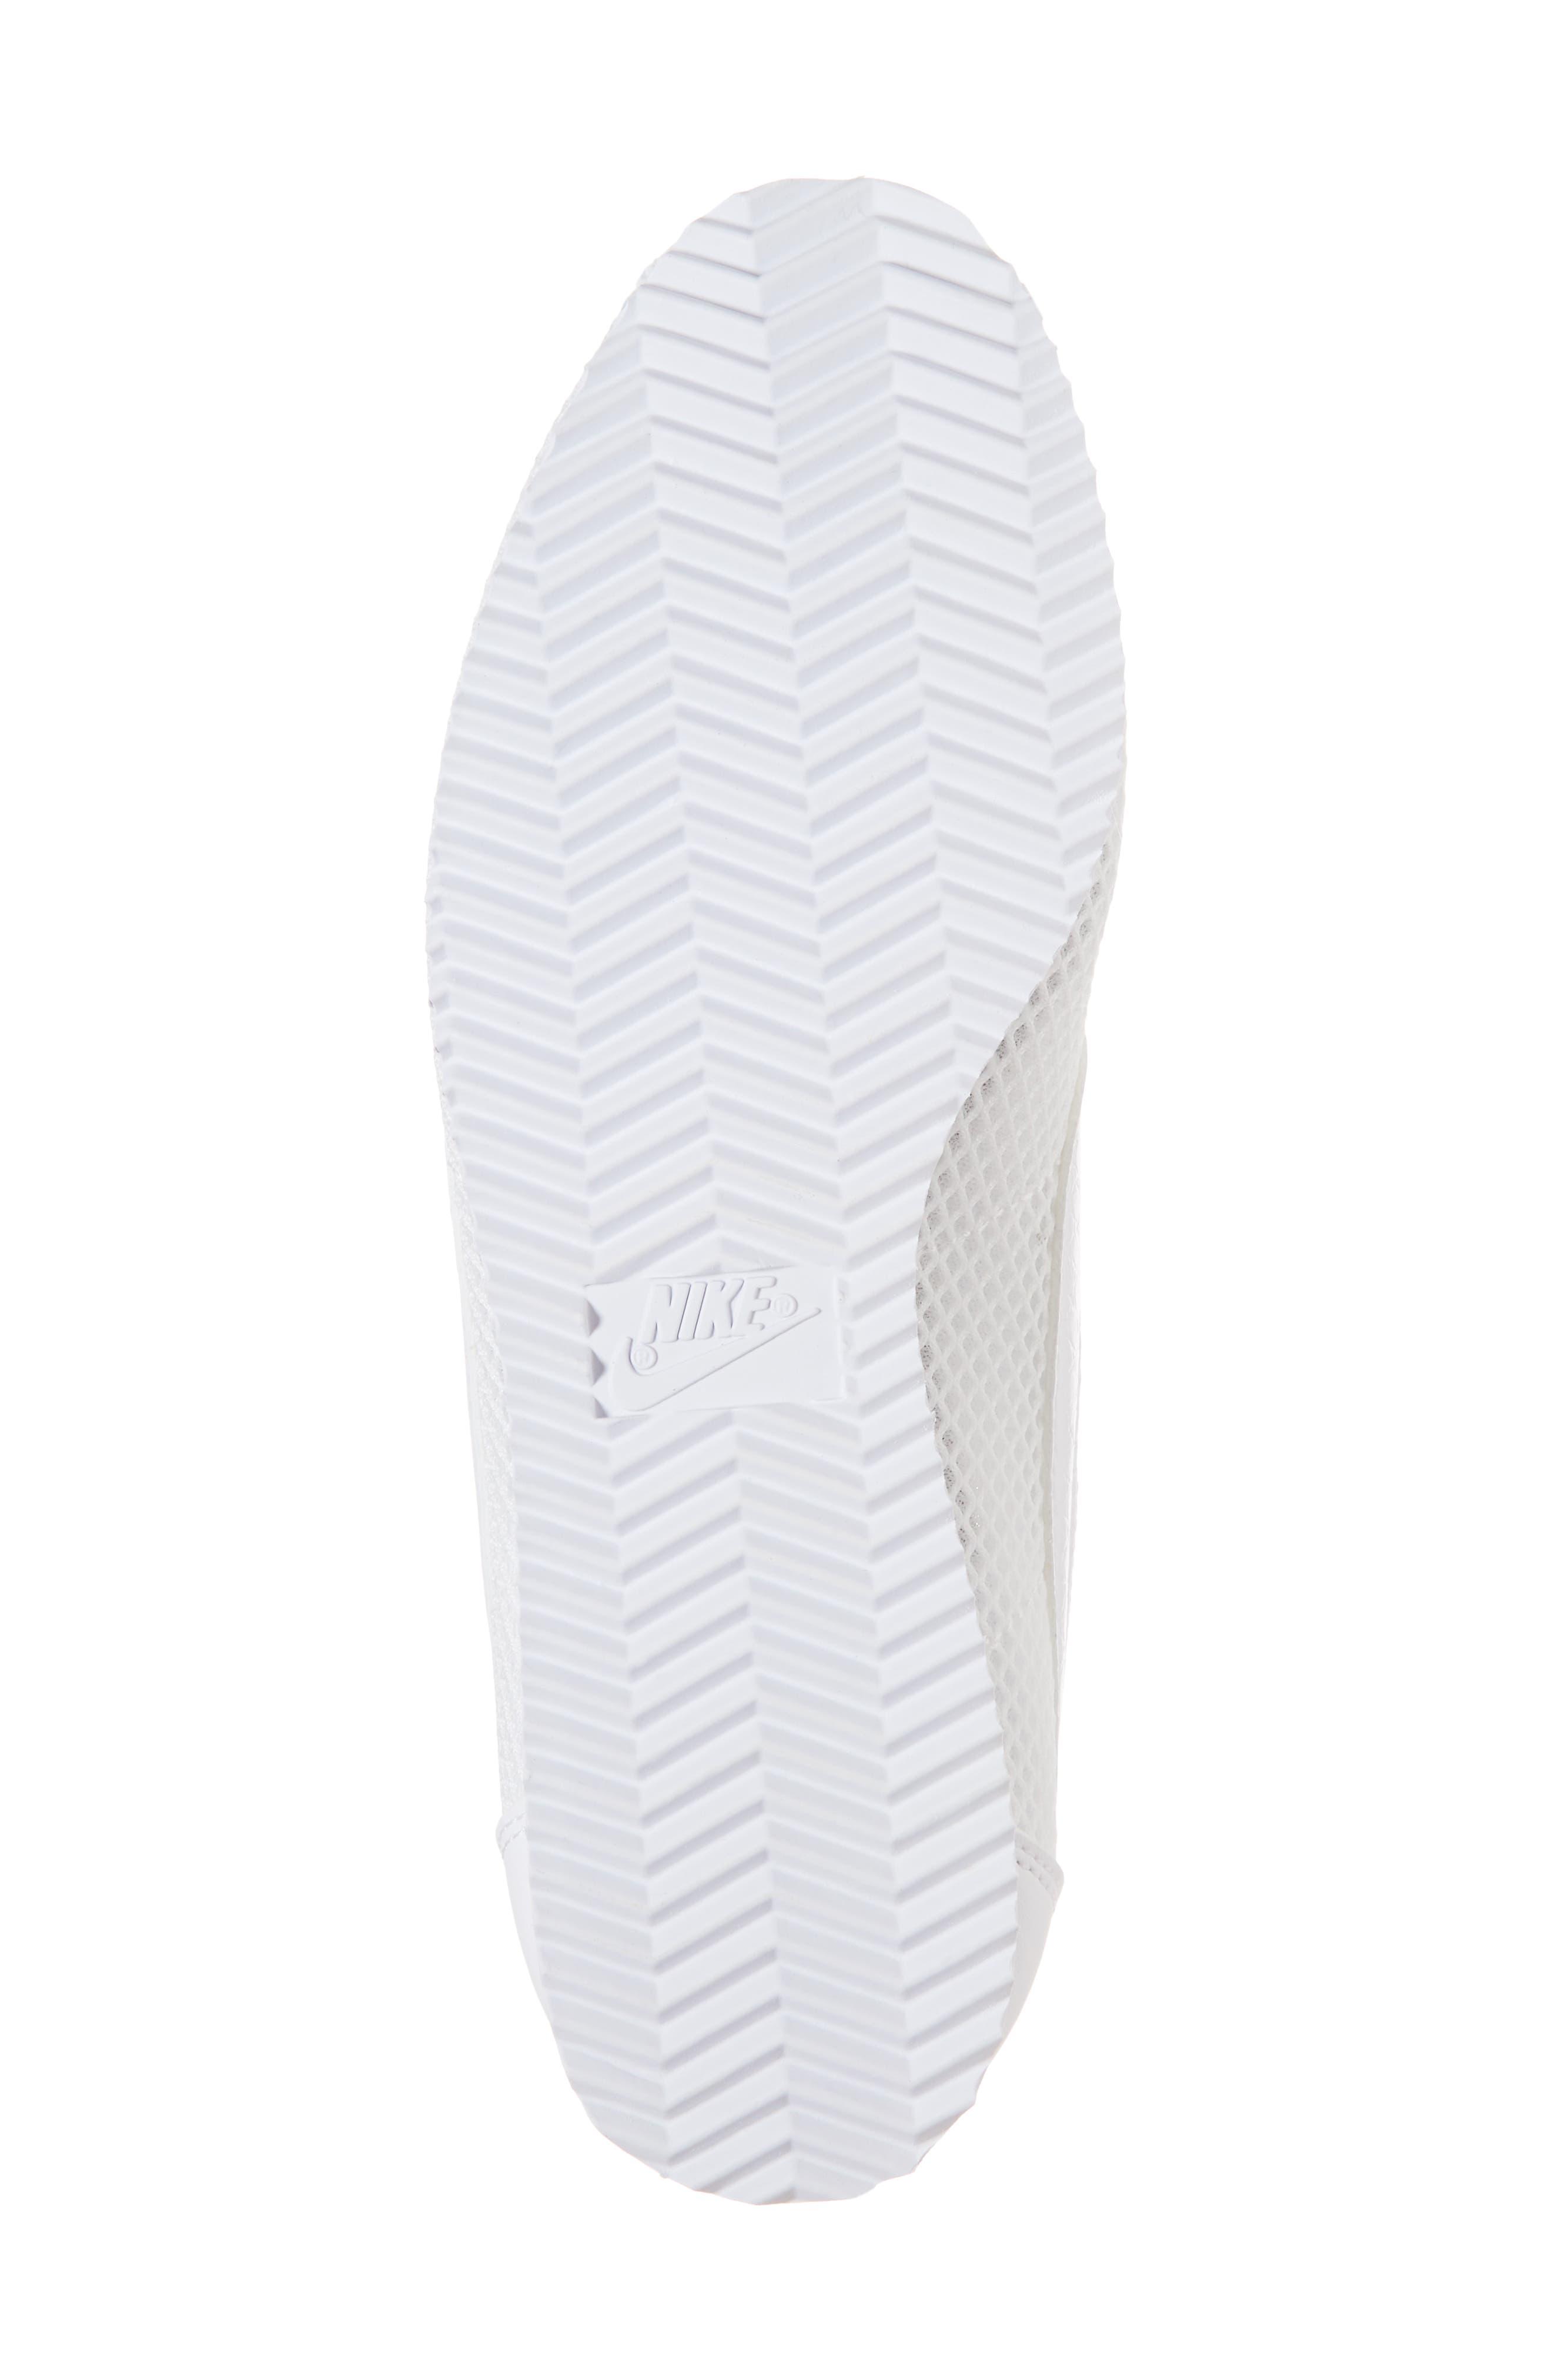 Classic Cortez Premium XLV Sneaker,                             Alternate thumbnail 6, color,                             White/ White